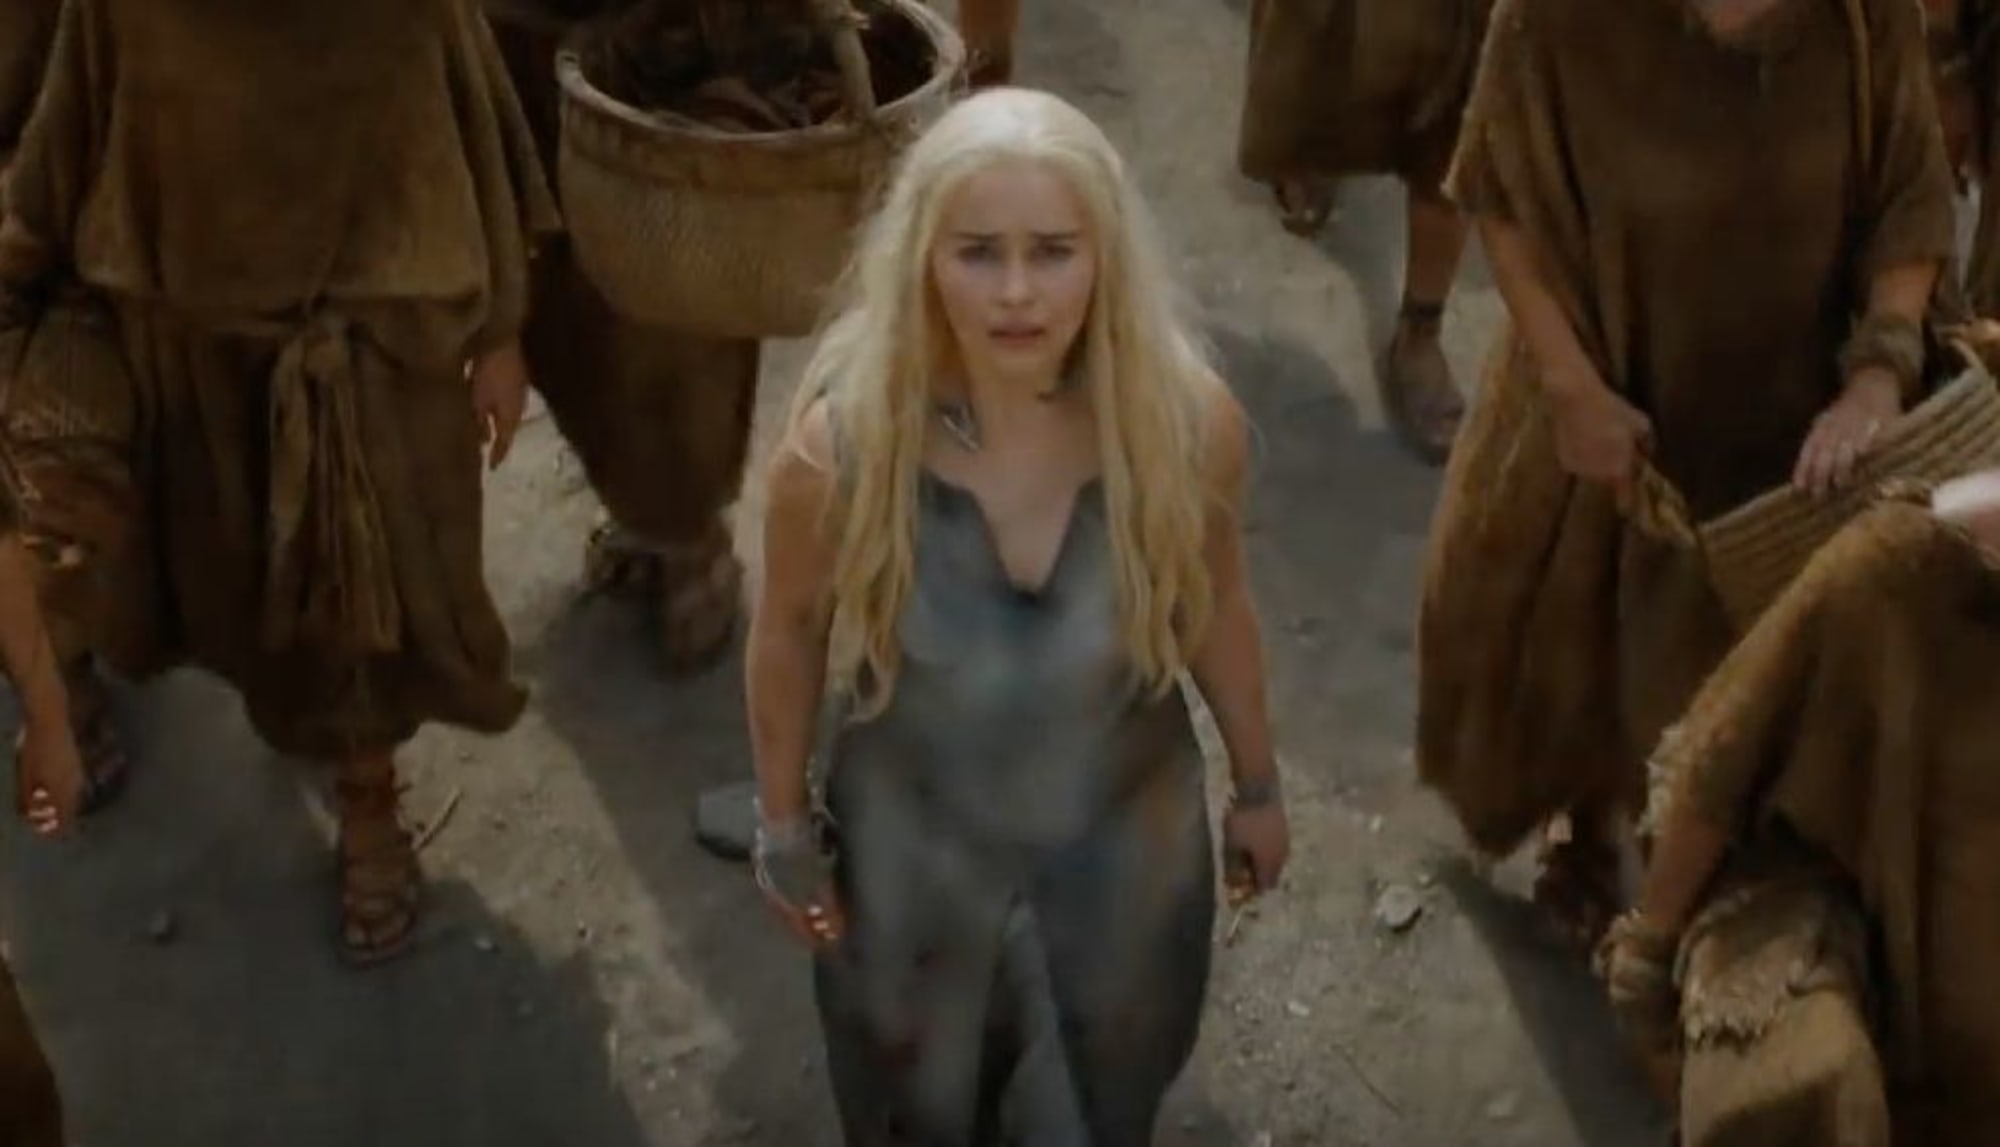 Game Of Thrones Season 6 Episode 3 Live Stream Watch Oathbreaker Online